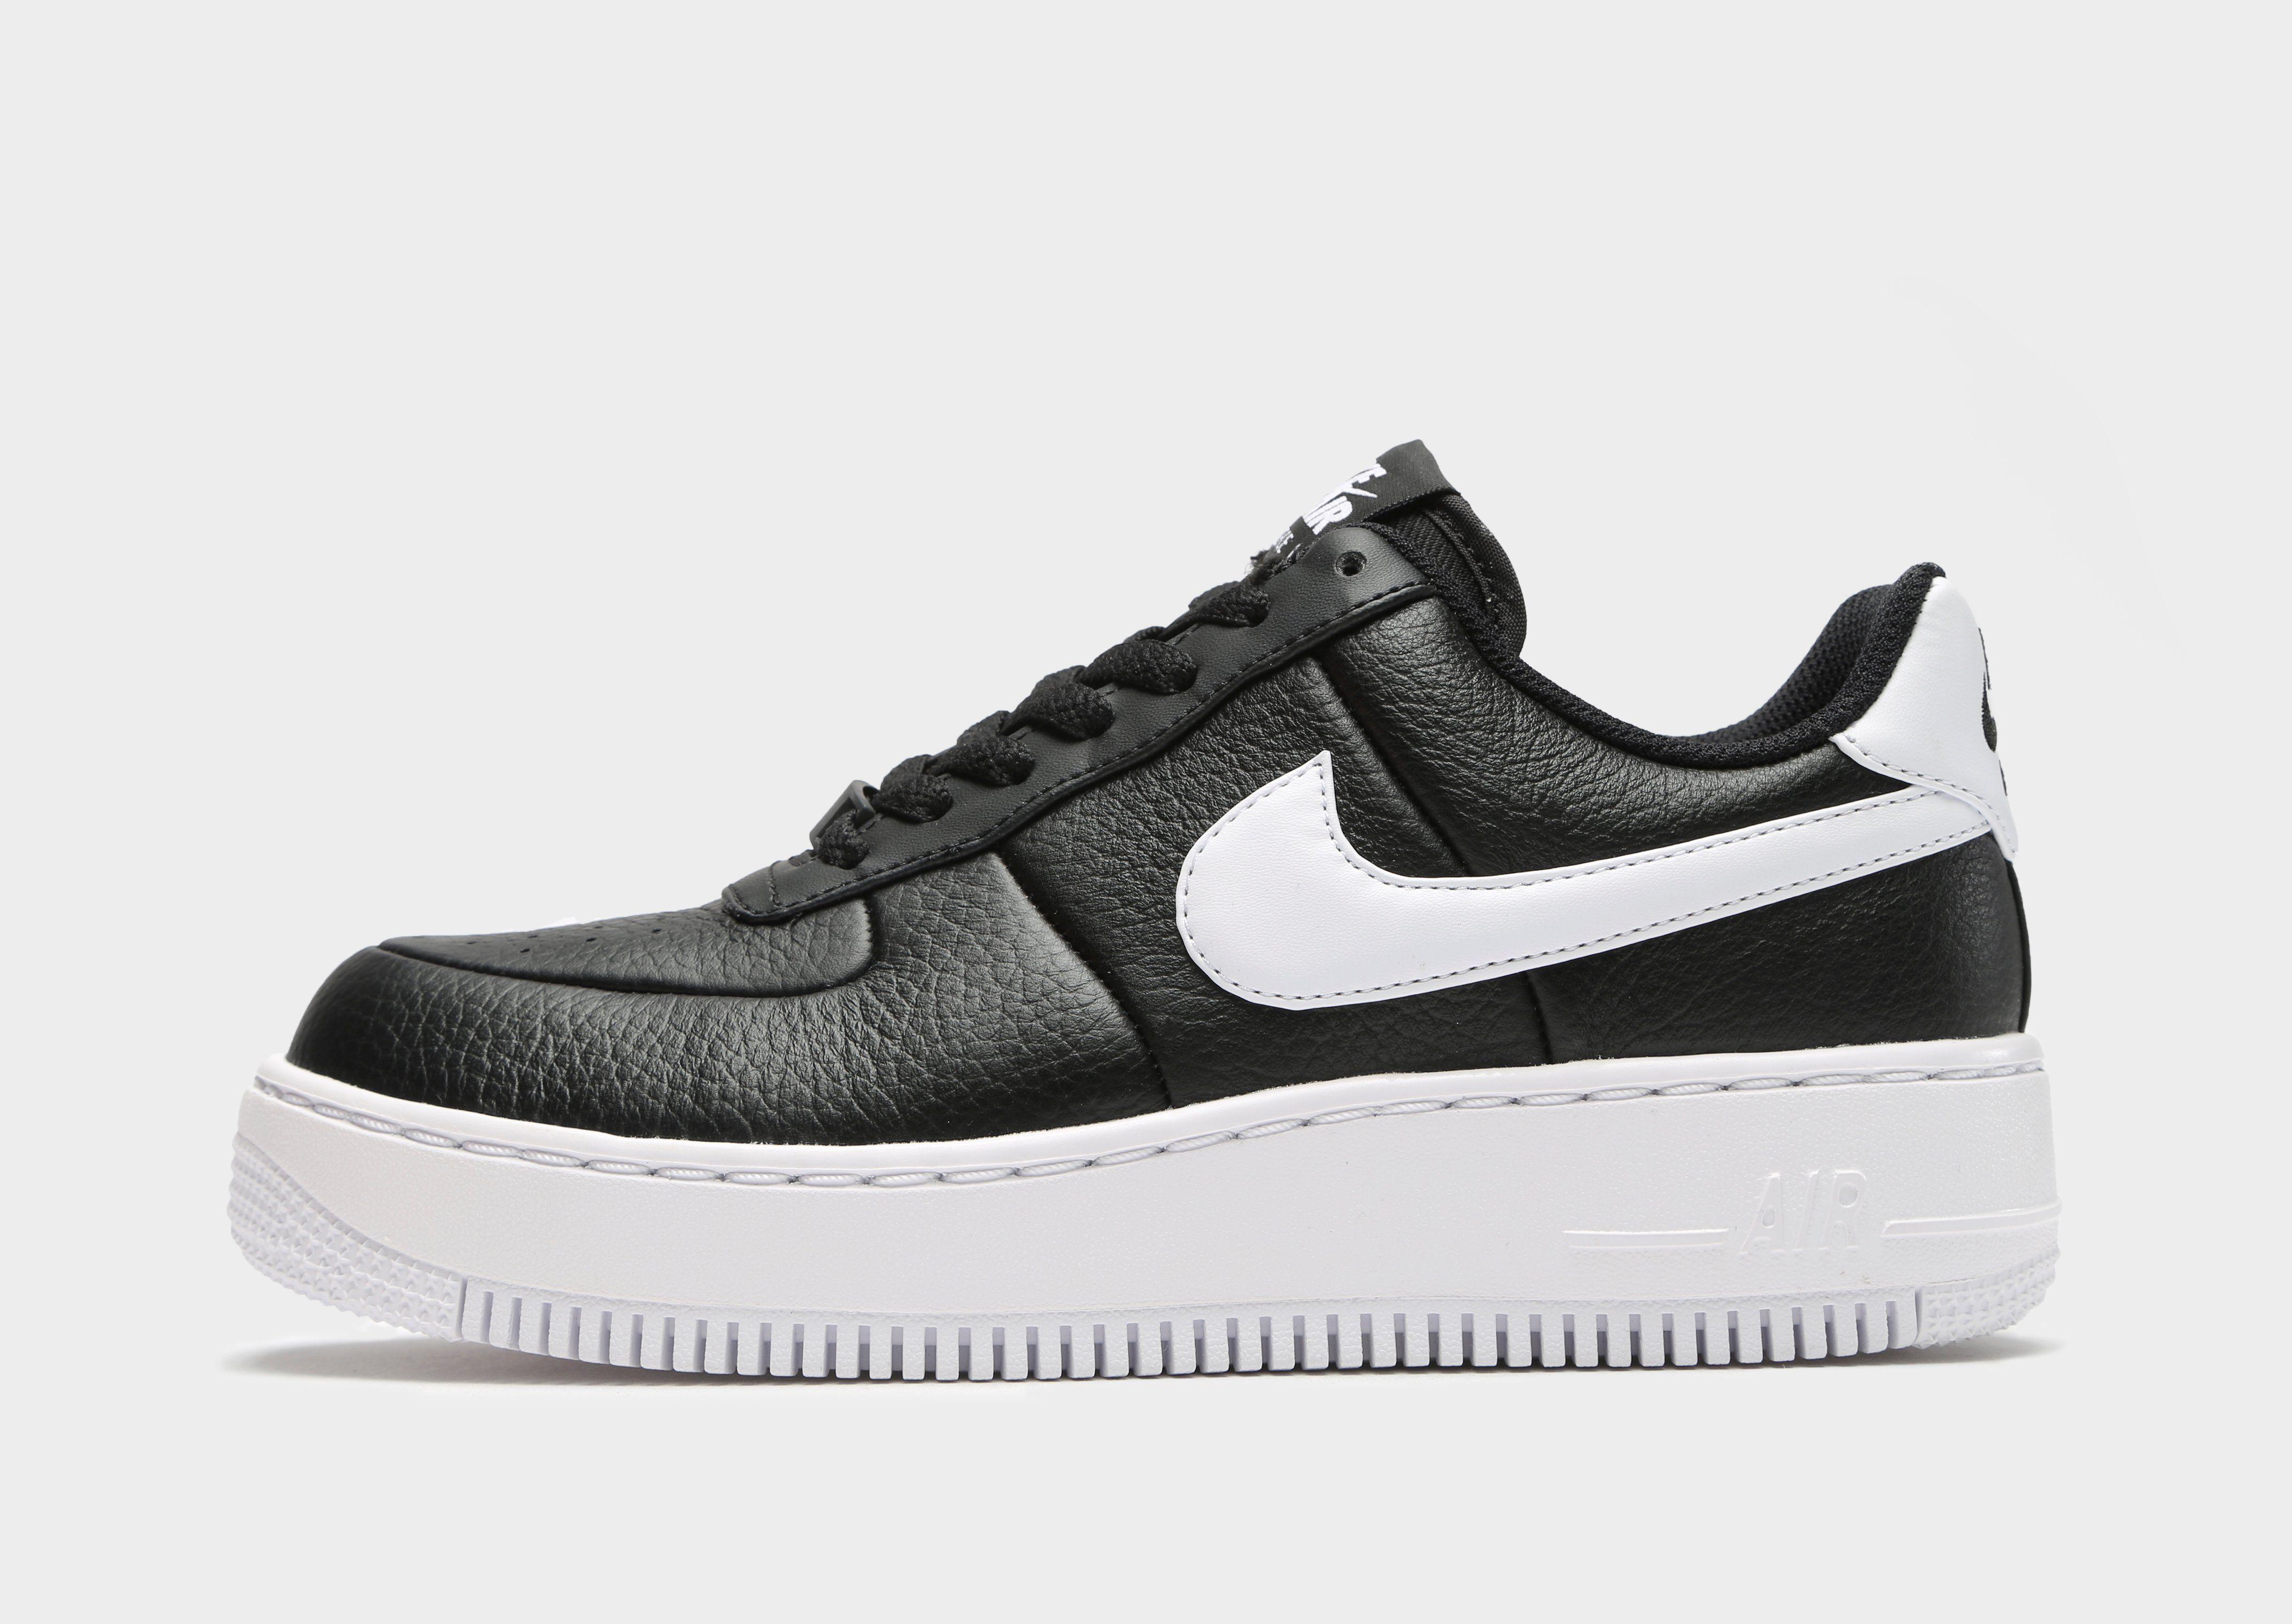 7c7cec113a248 Nike Air Force 1 Upstep Women s